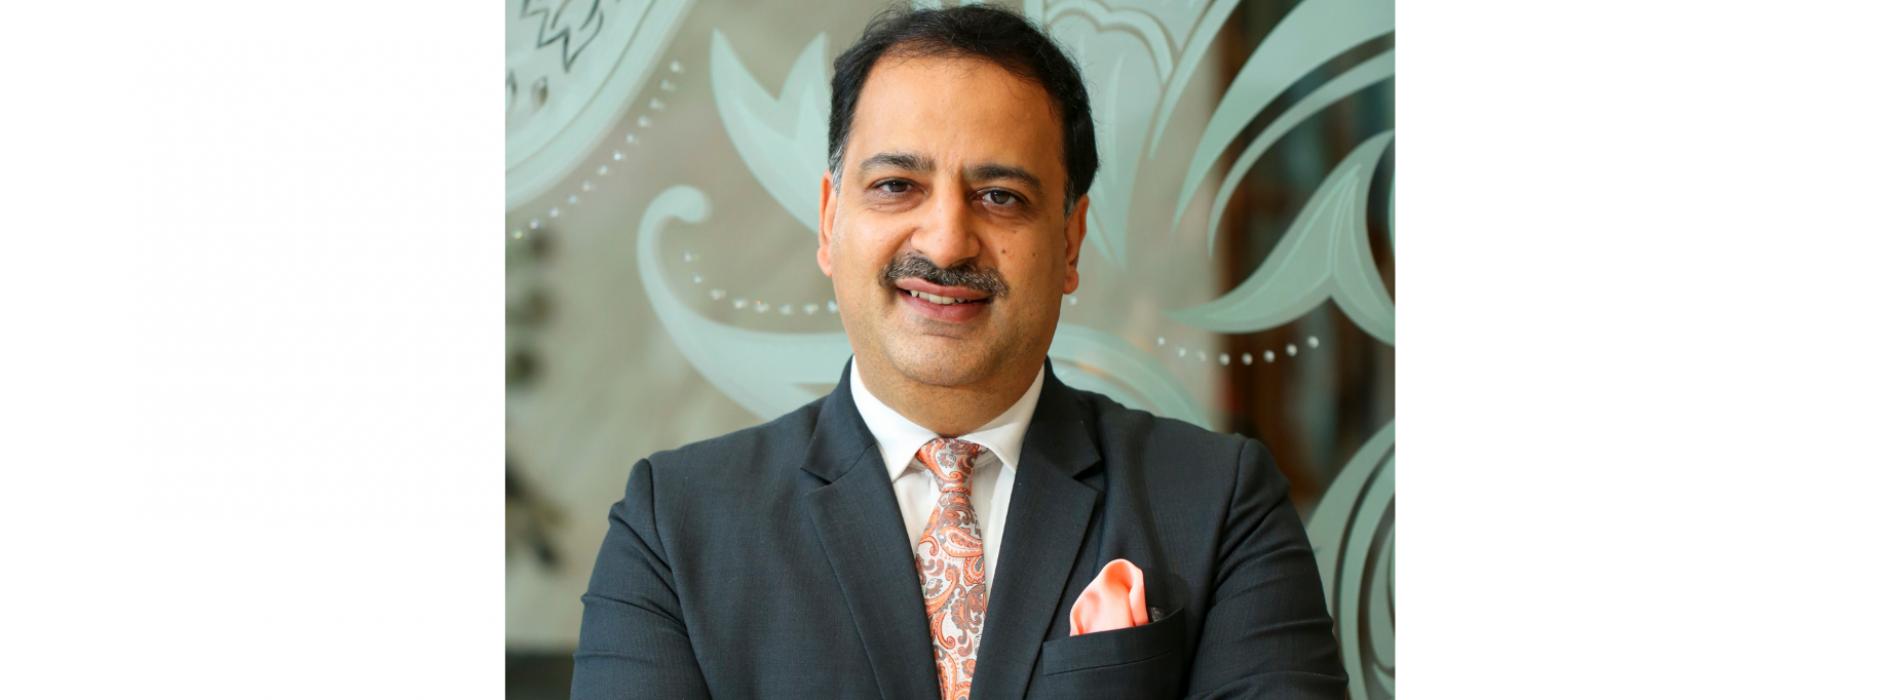 Sumeet Suri is the new General Manager of JW Marriott Kolkata